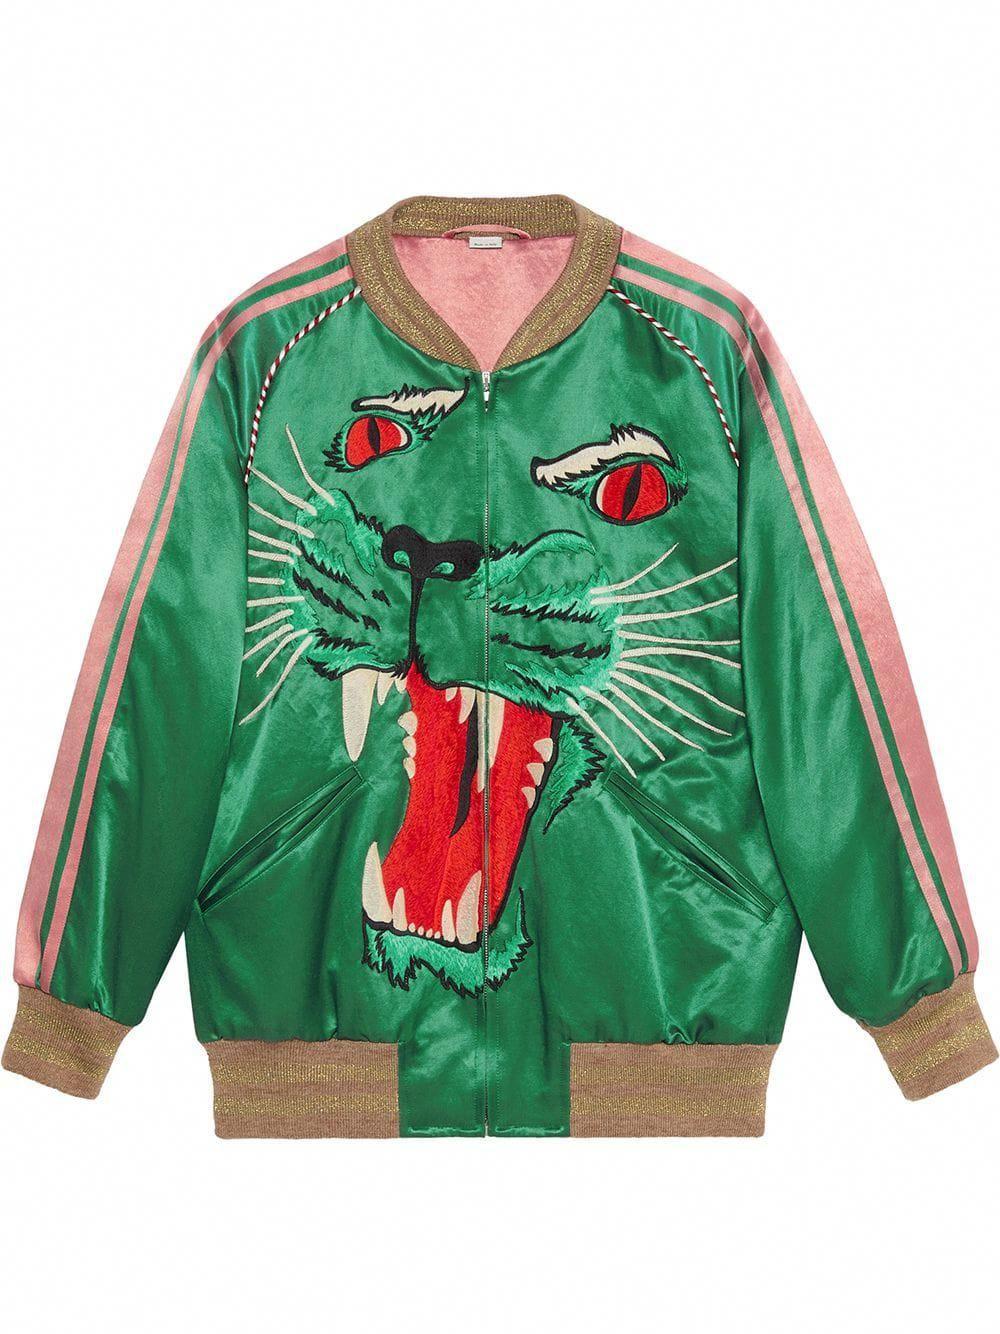 Gucci Bomber Jacket With Panther Face Green Leatherjacketsformenblue Designer Bomber Jacket Bomber Jacket Leather Jacket Men [ 1334 x 1000 Pixel ]